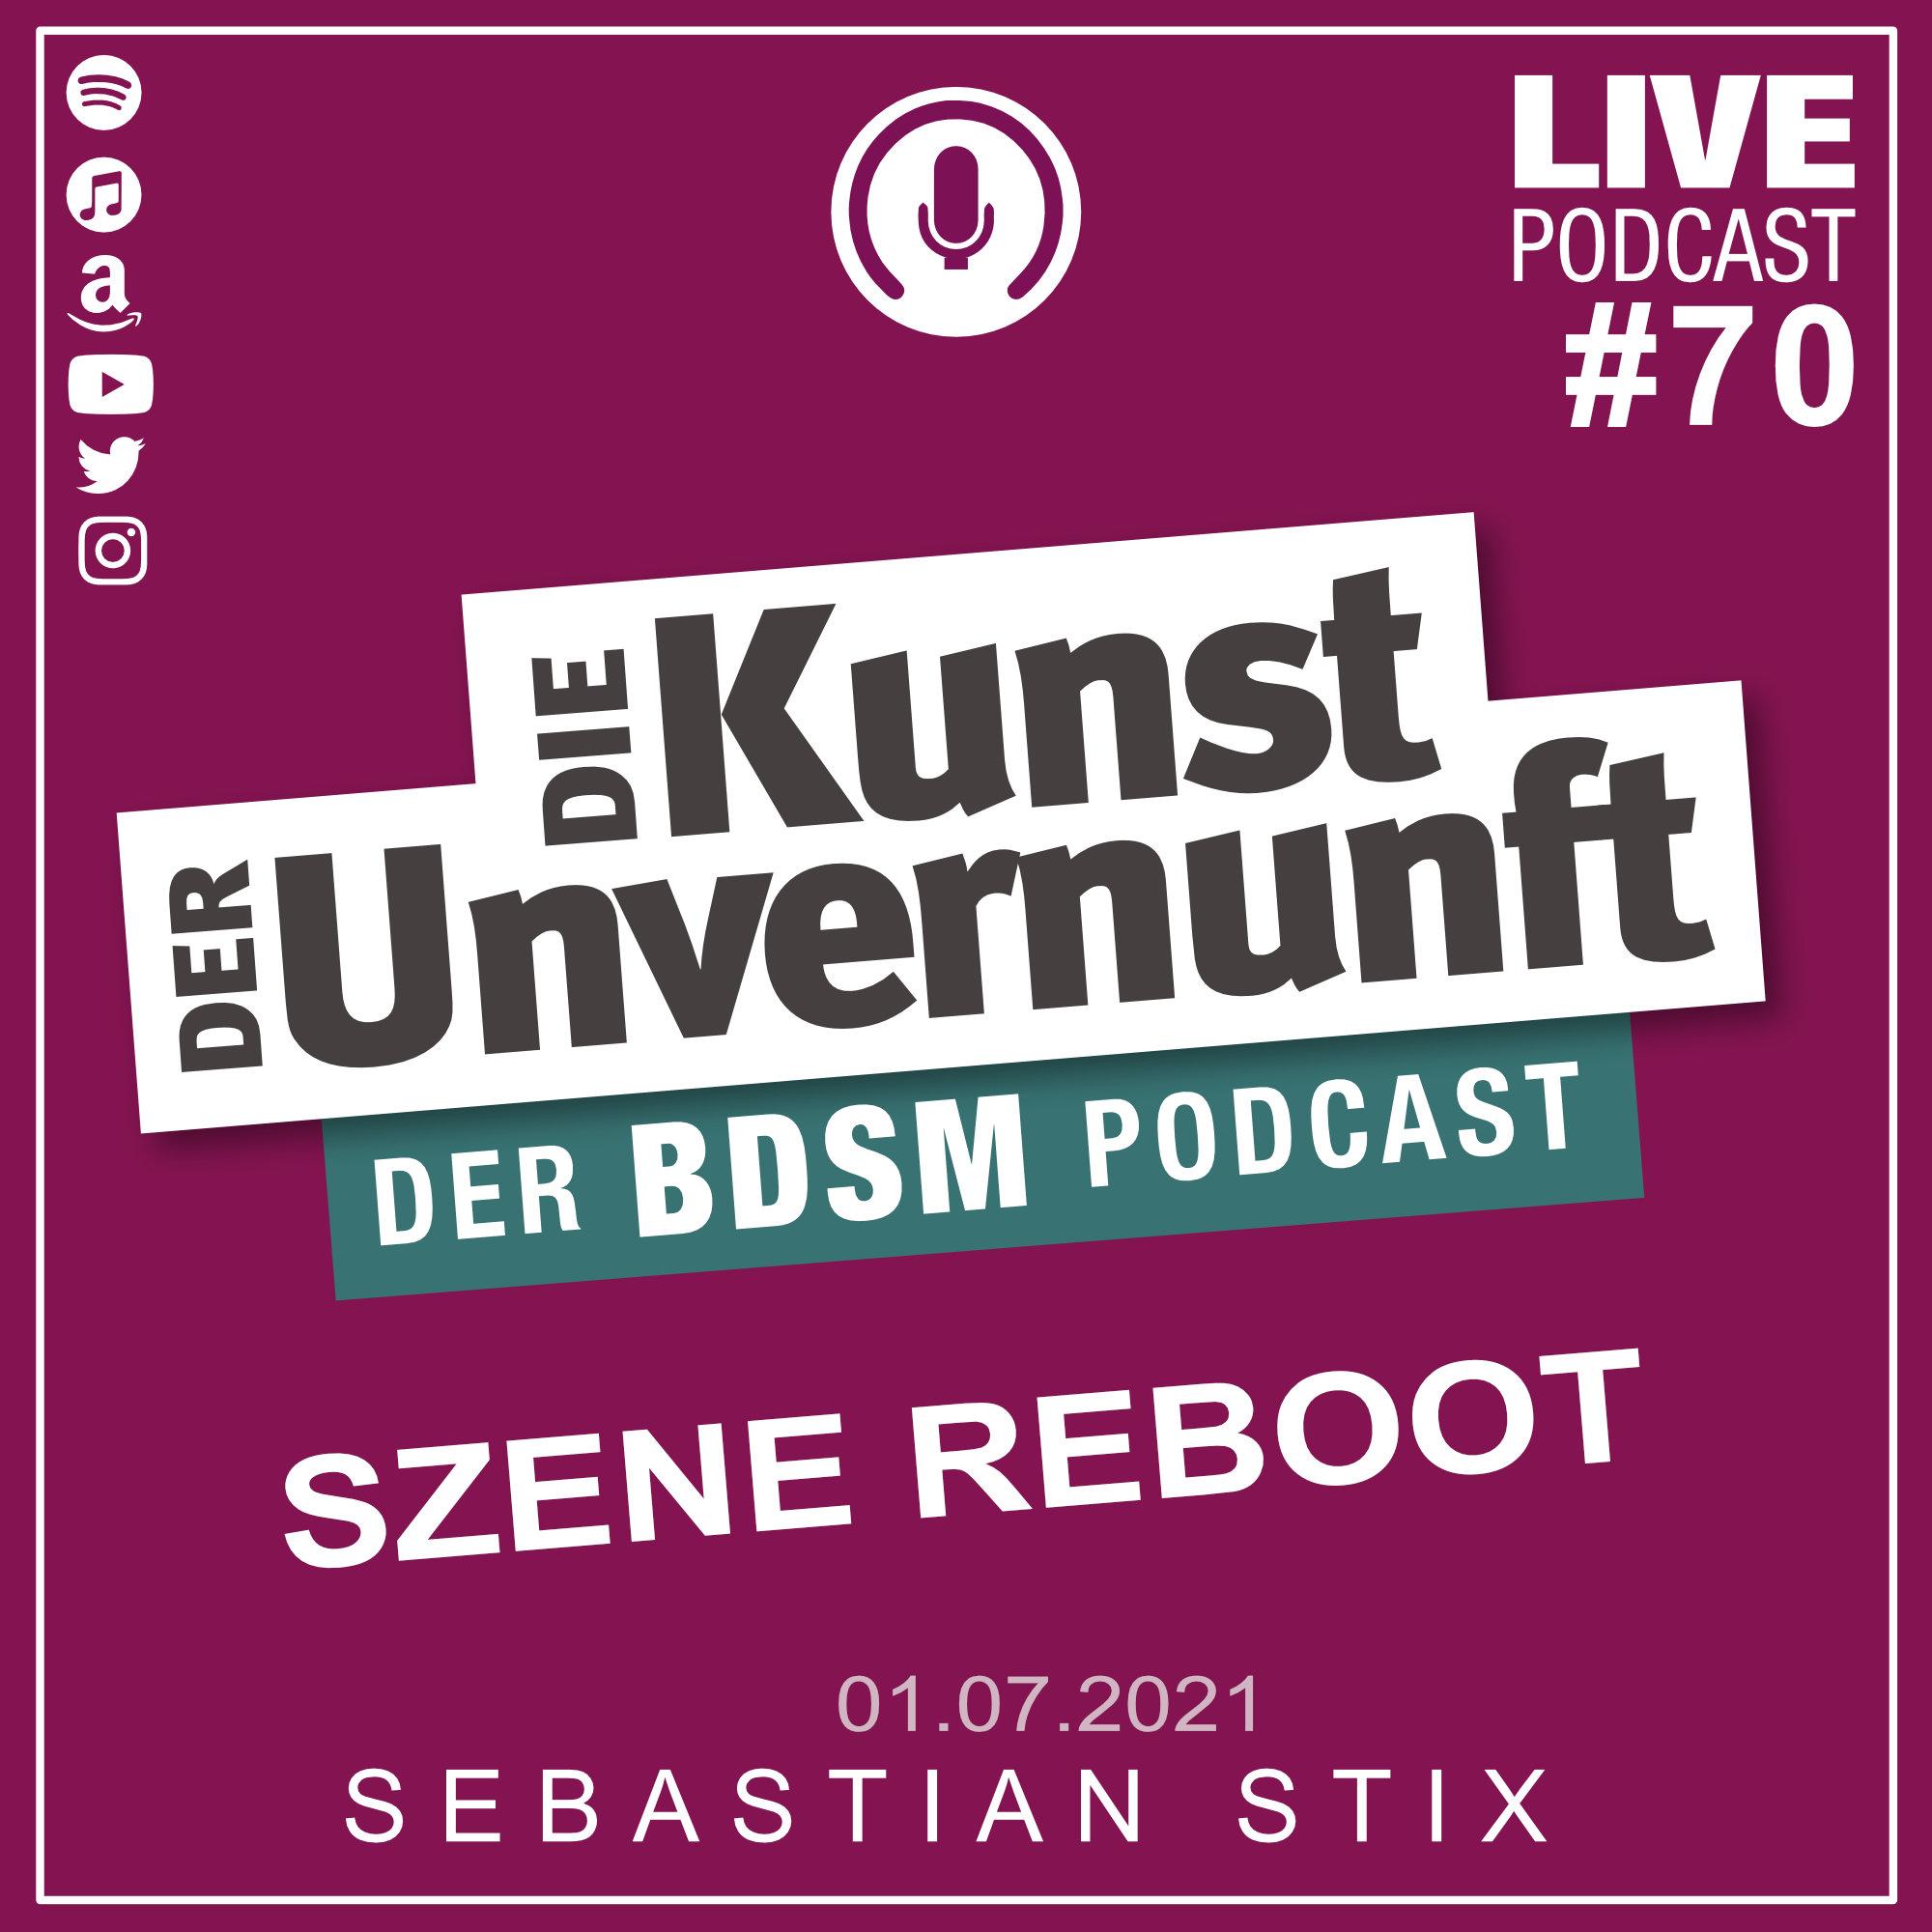 Unvernunft Live 01.07.2021 - Thema SZENE REBOOT